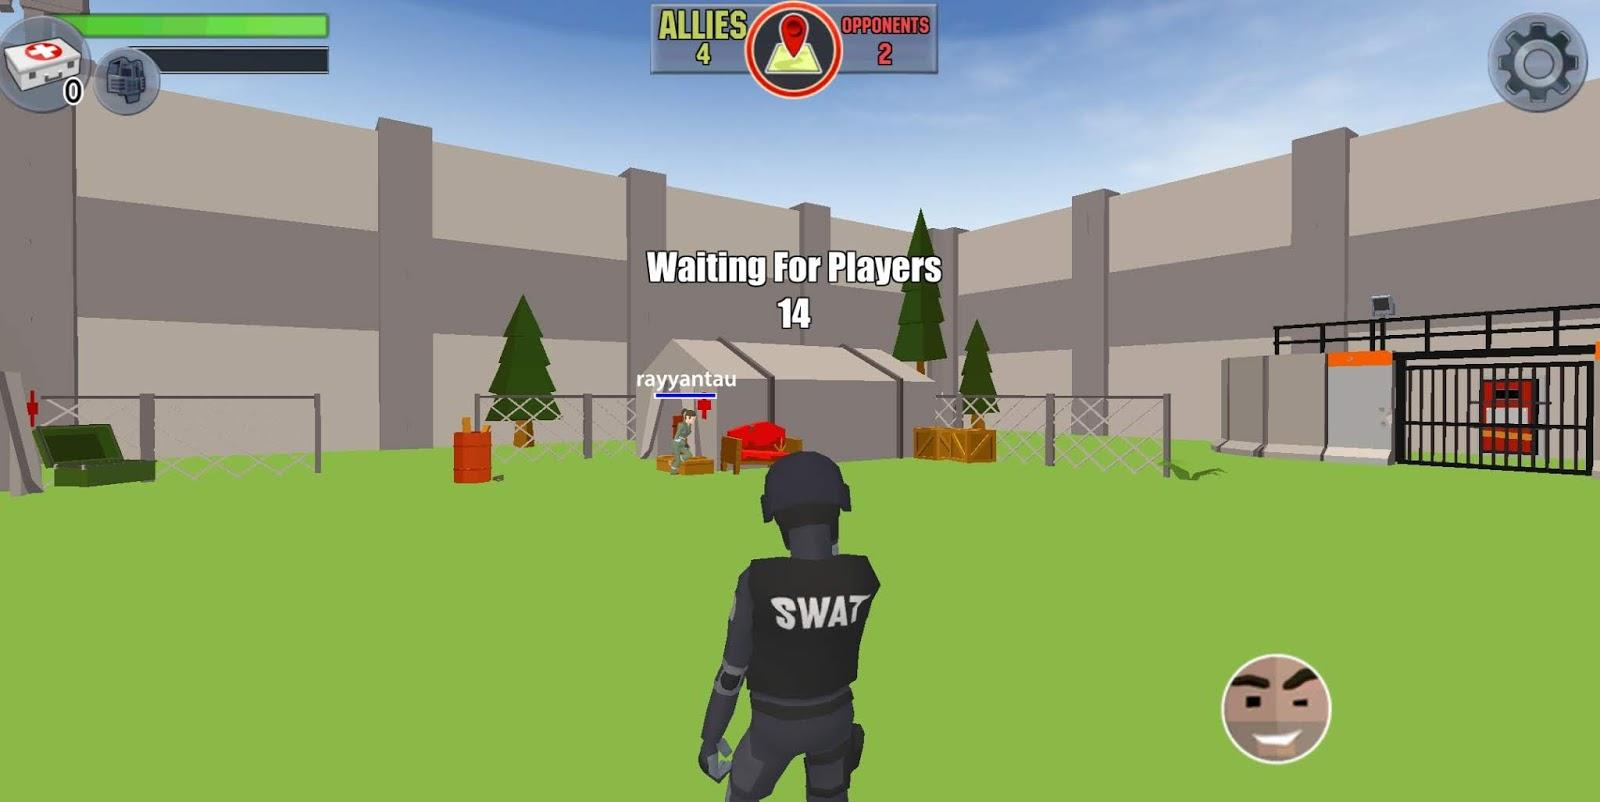 Battle Royal FPS Shooter Mod Apk Version 1 10 04 Unlimited Money